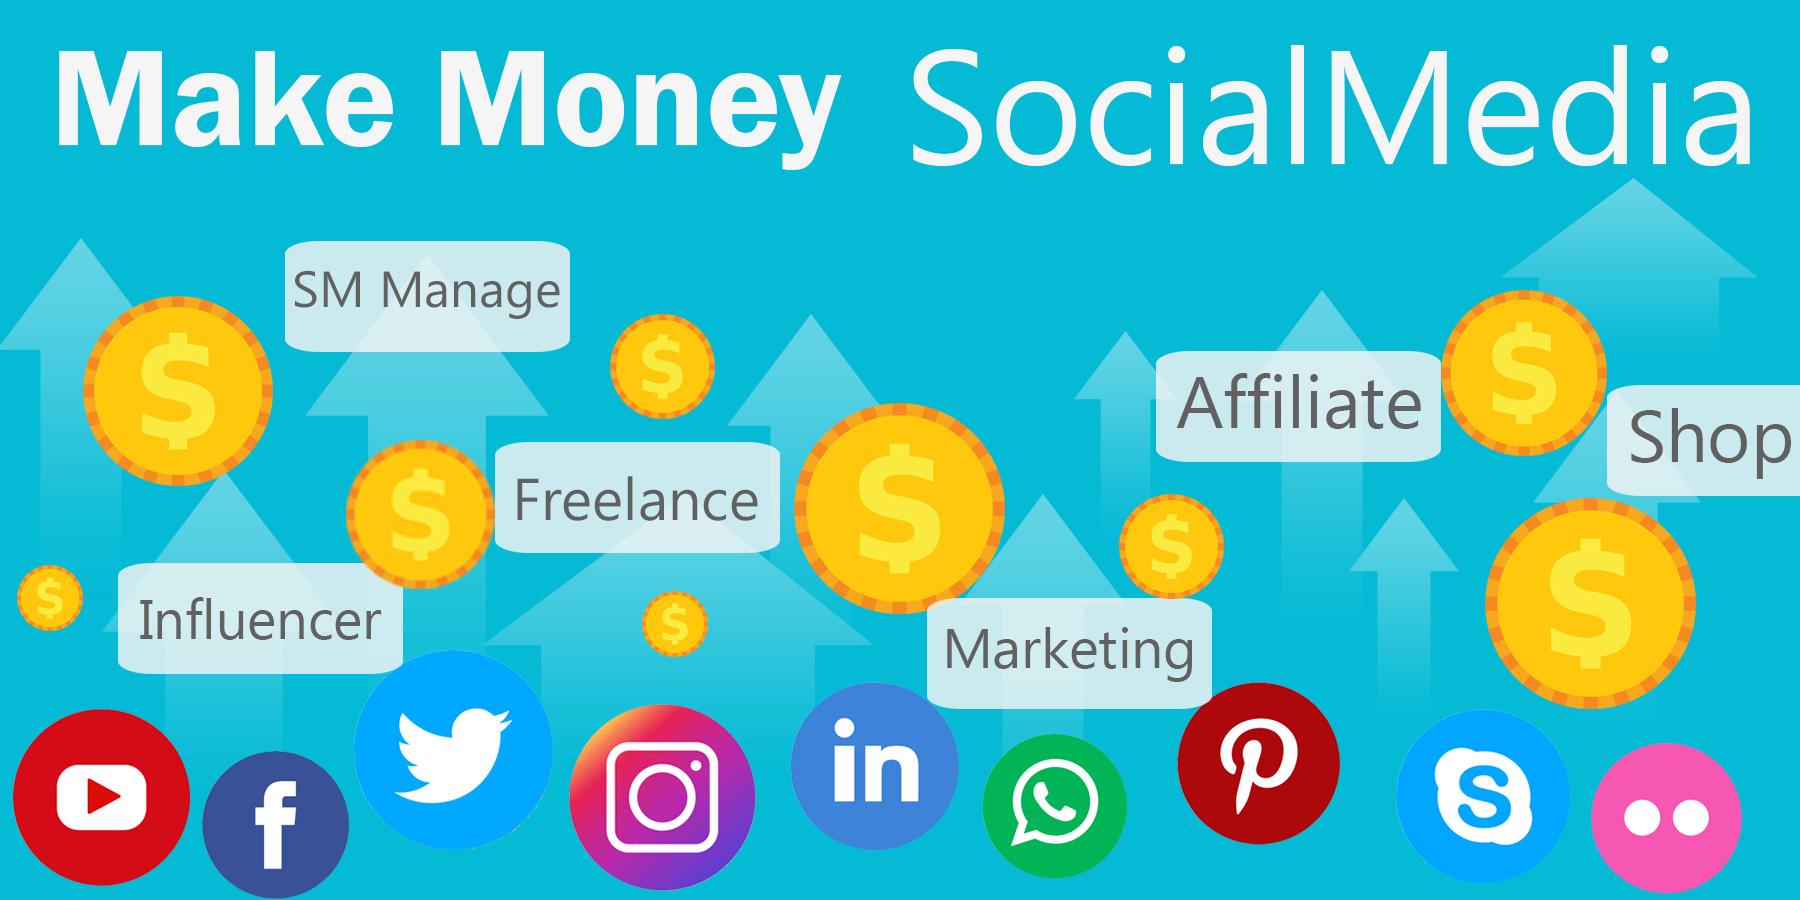 How to Make Money from Social Media Platforms - Meta Tech